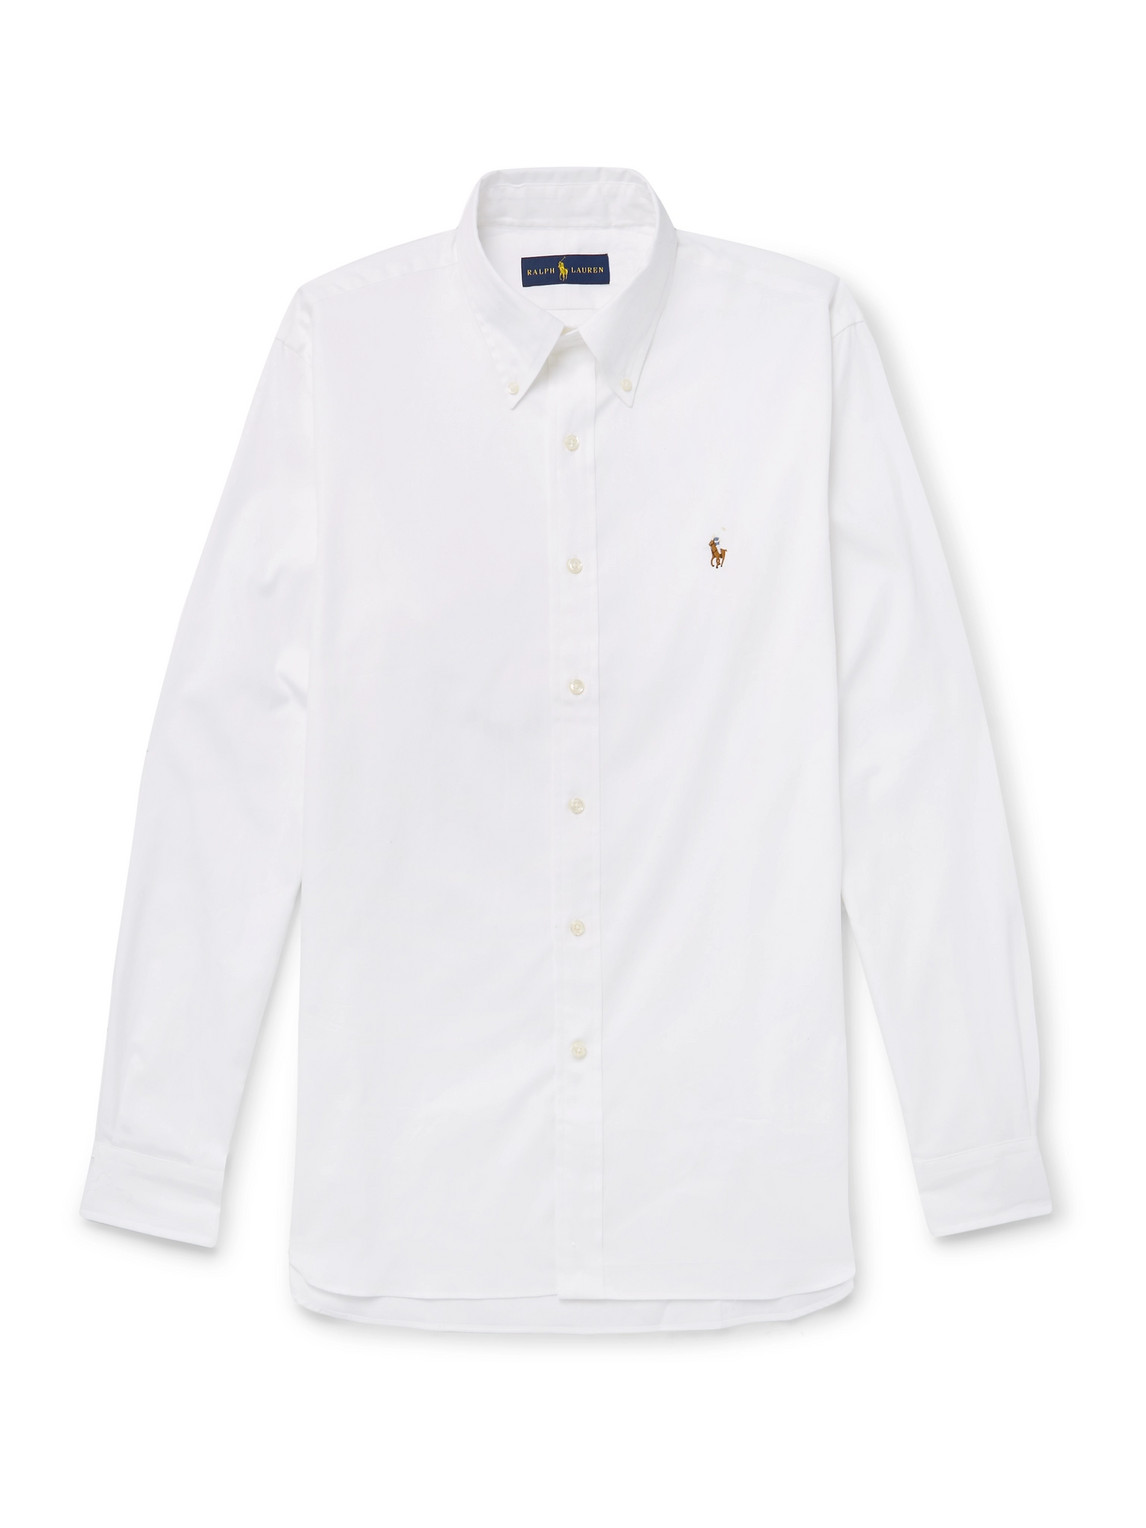 Polo Ralph Lauren - Button-Down Collar Cotton-Piqué Shirt - Men - White - Uk/Us 18